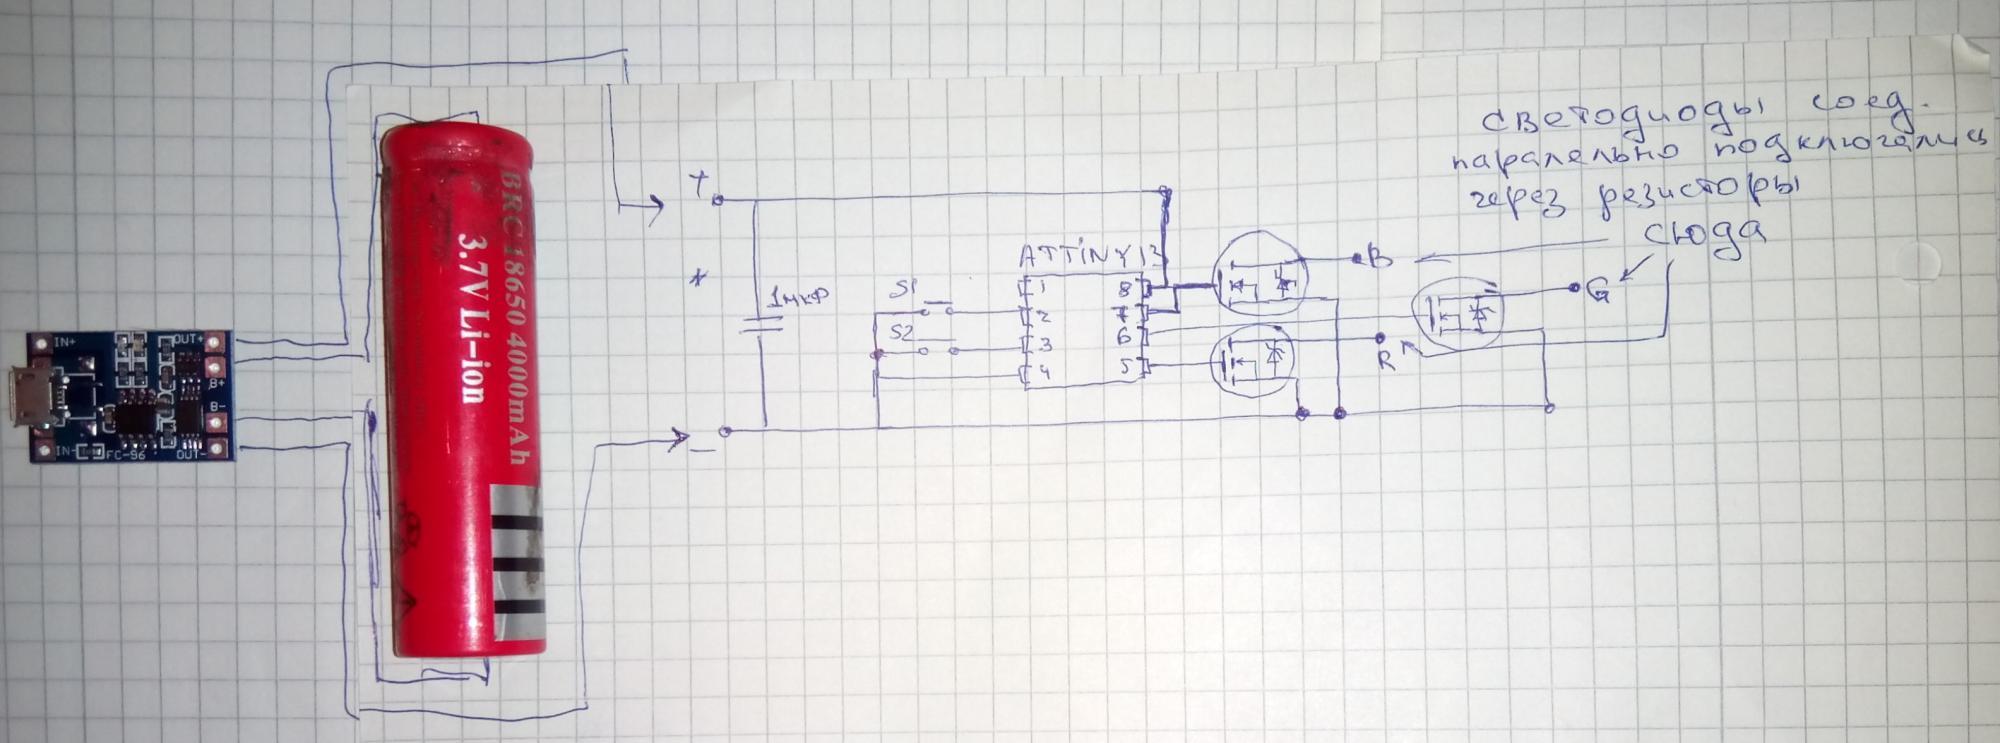 Схема контроллера заряда li-ion аккумулятора 18650